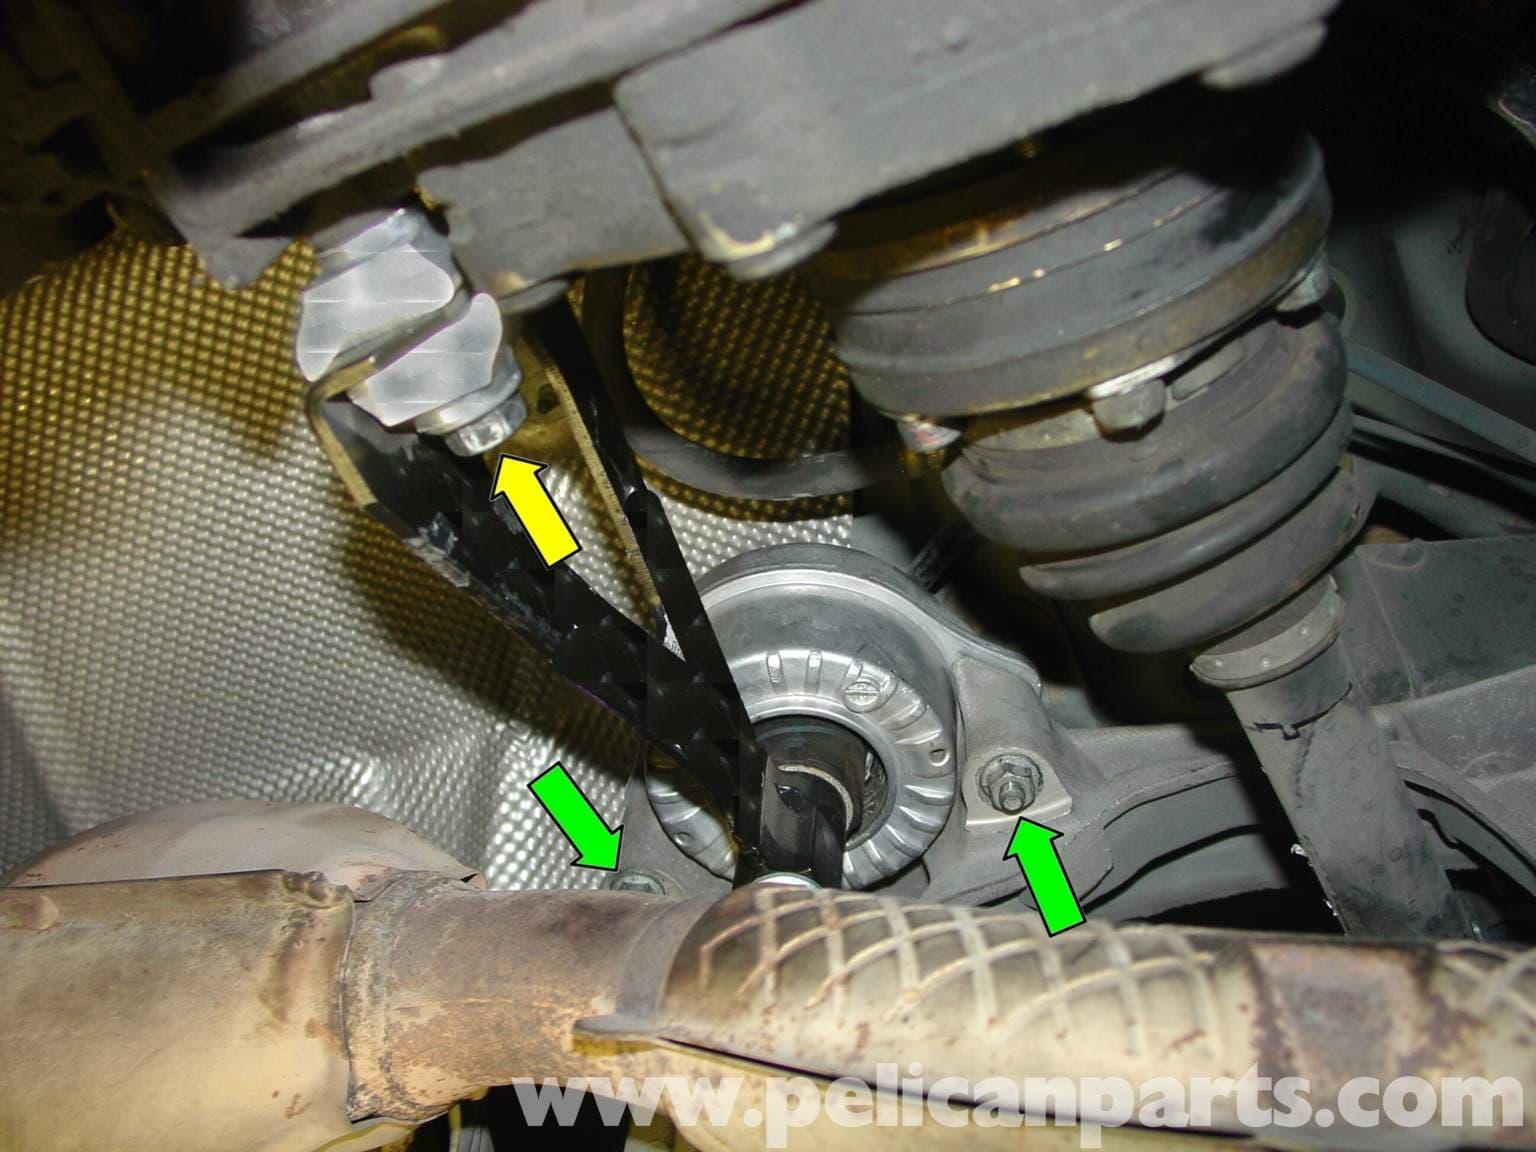 Porsche Boxster Transmission Mount Replacement 986 987